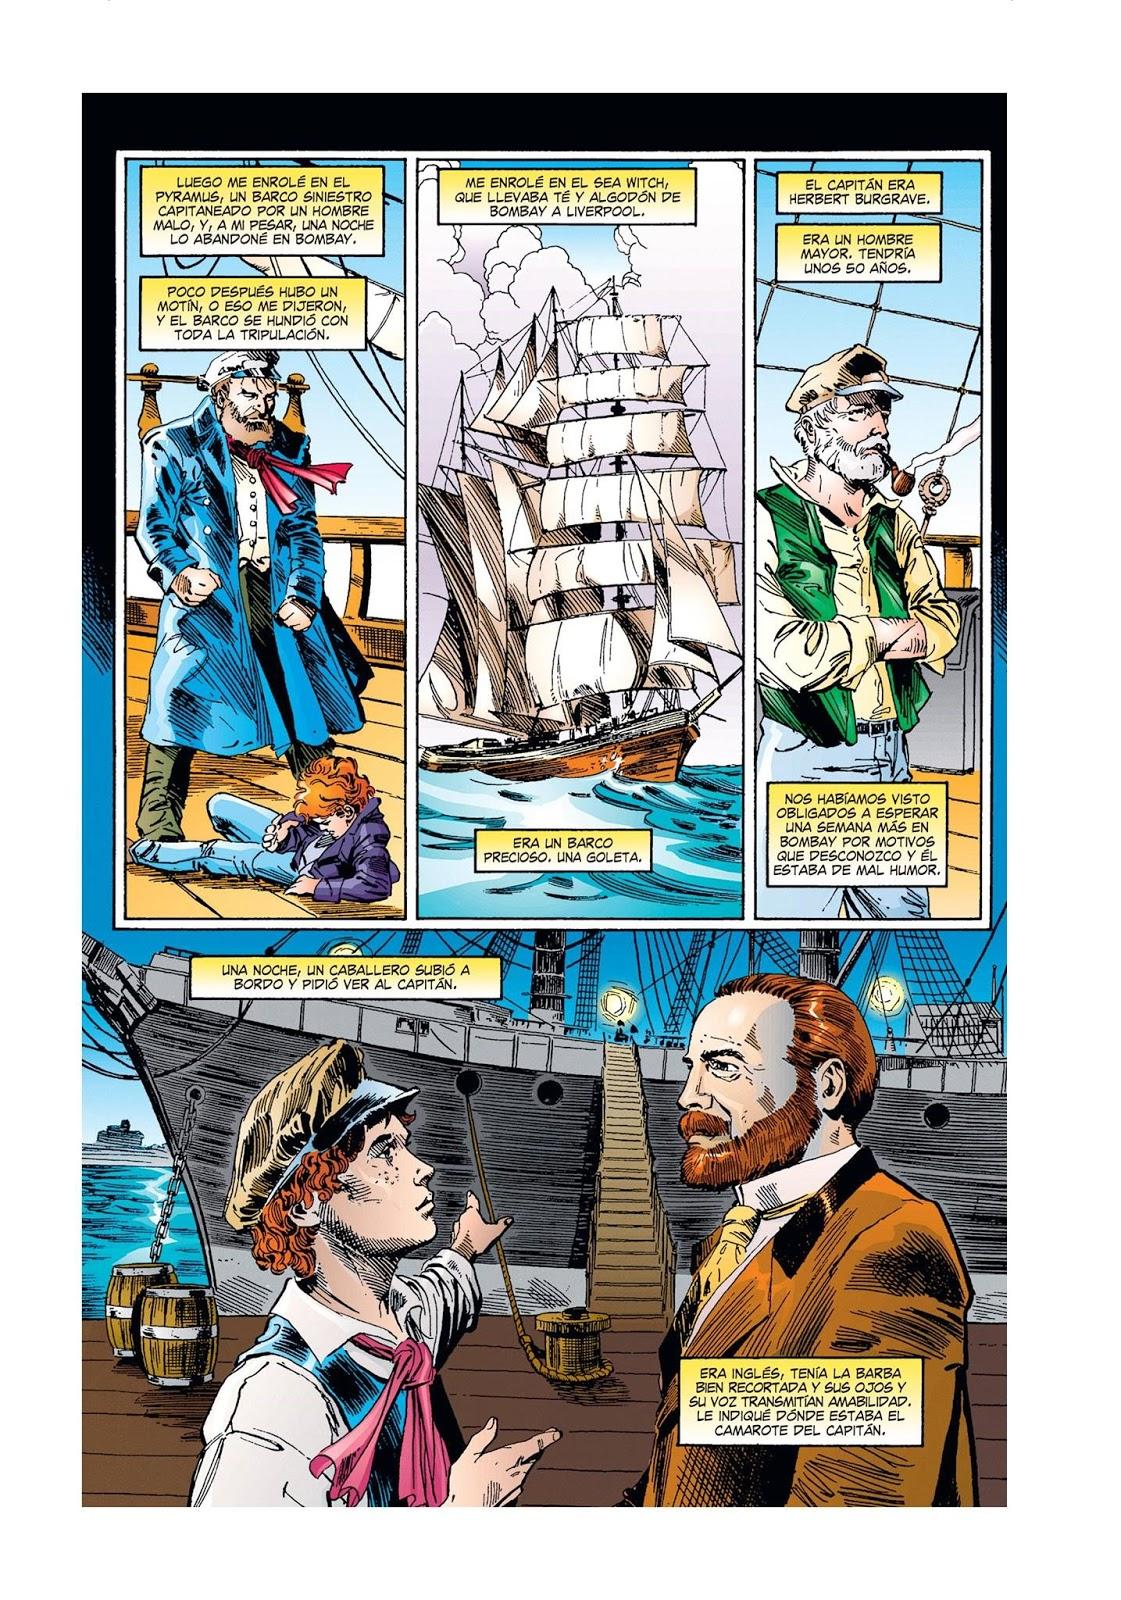 Capitan Cavernicola In English